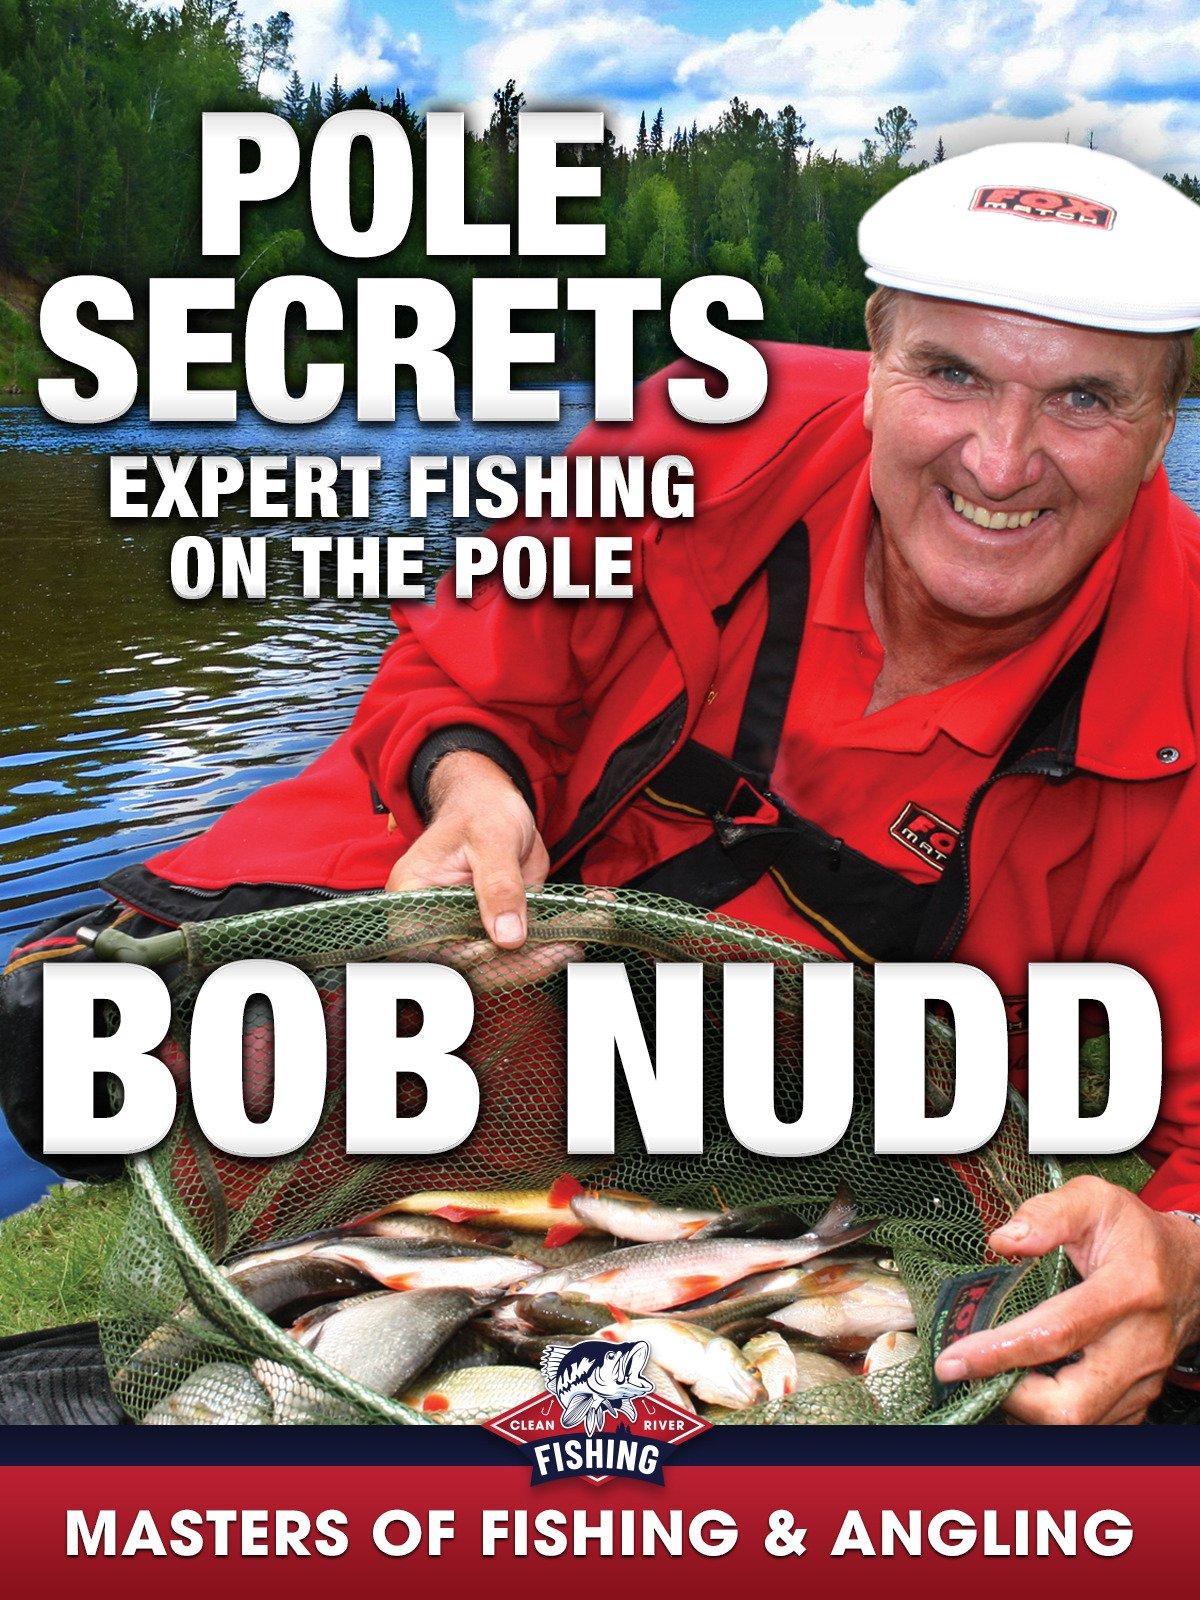 Pole Secrets: Expert Fishing on the Pole